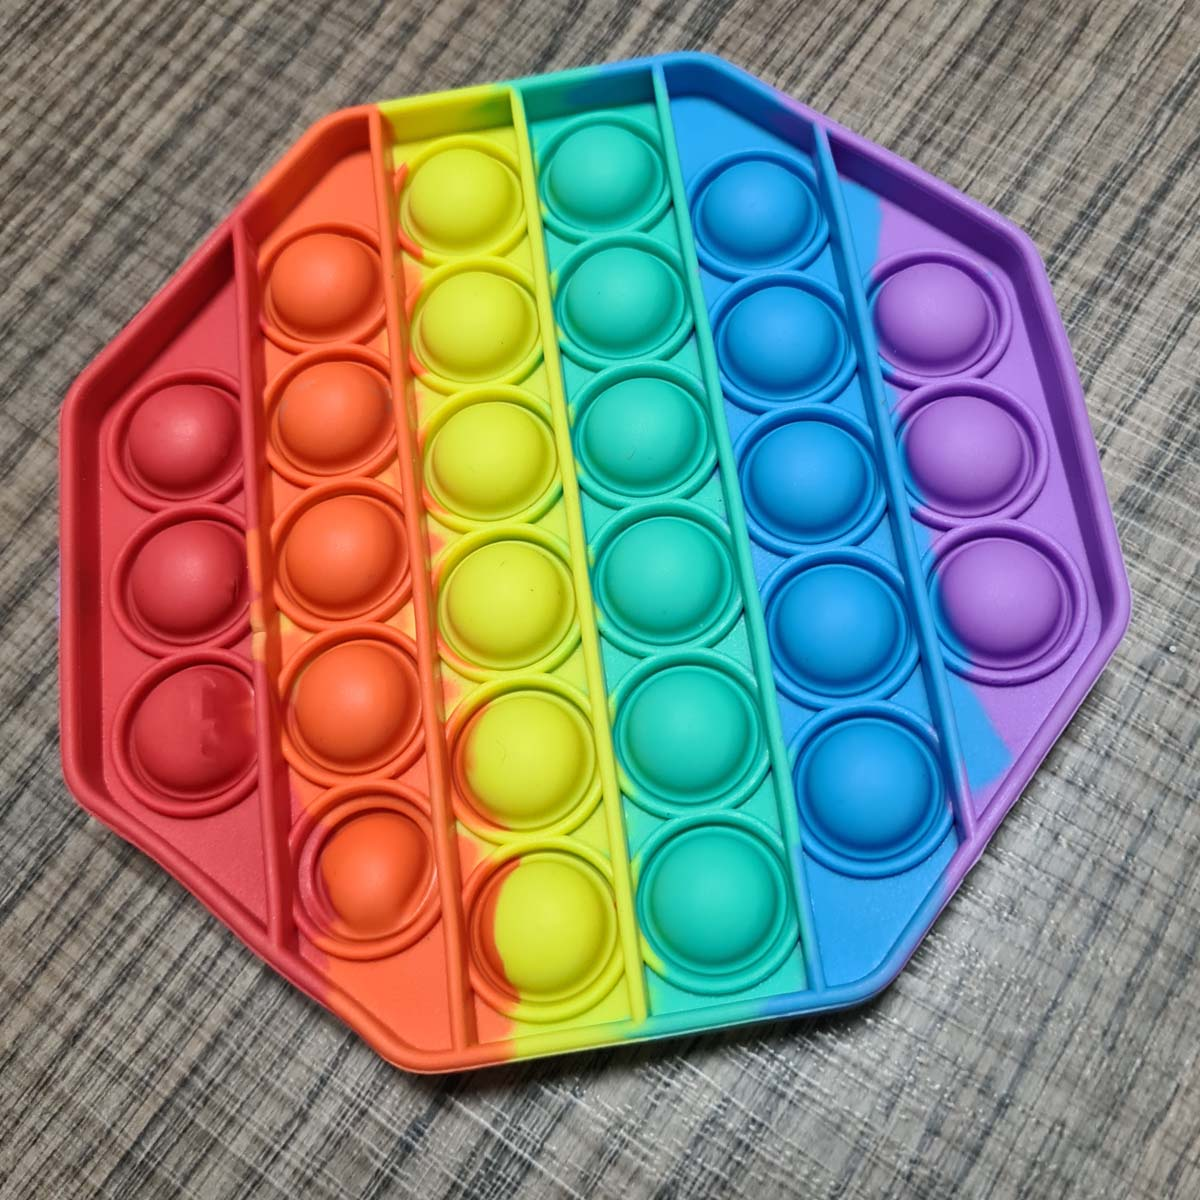 Brinquedo Pop It Fidget Toys Anti Stress Sensorial Colorido